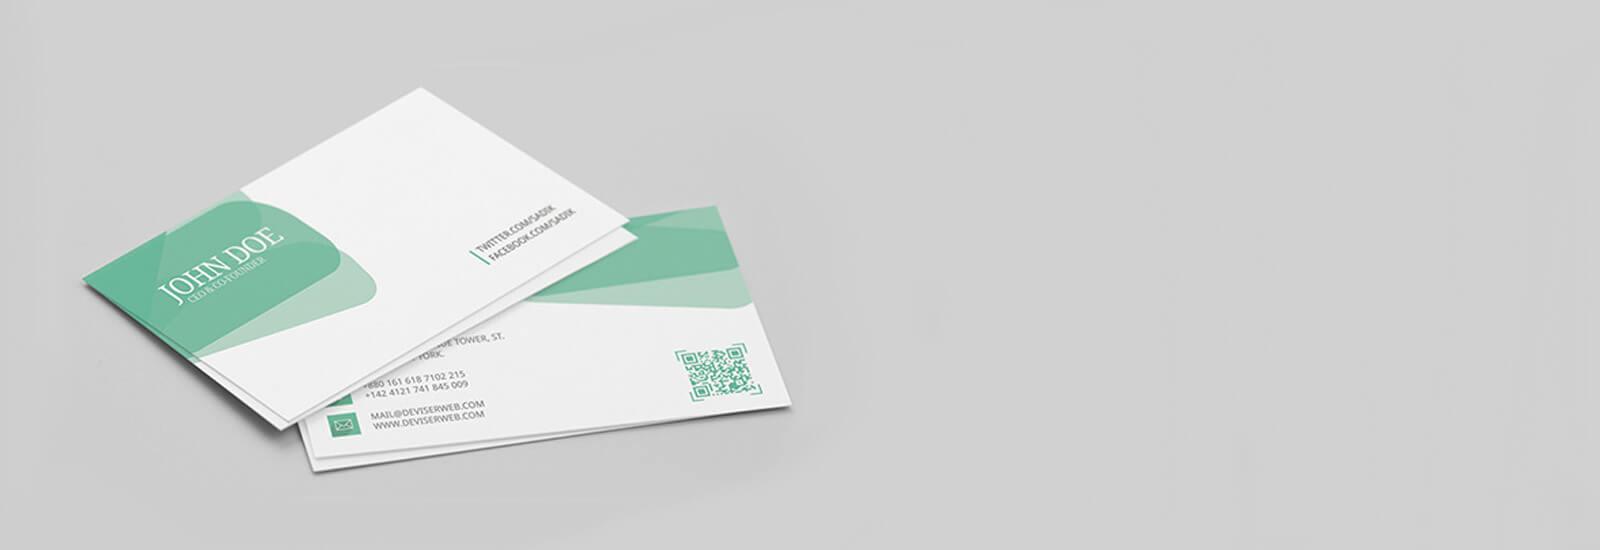 Testimonial 4 - image slider-business-card on https://corporateprinters.com.au